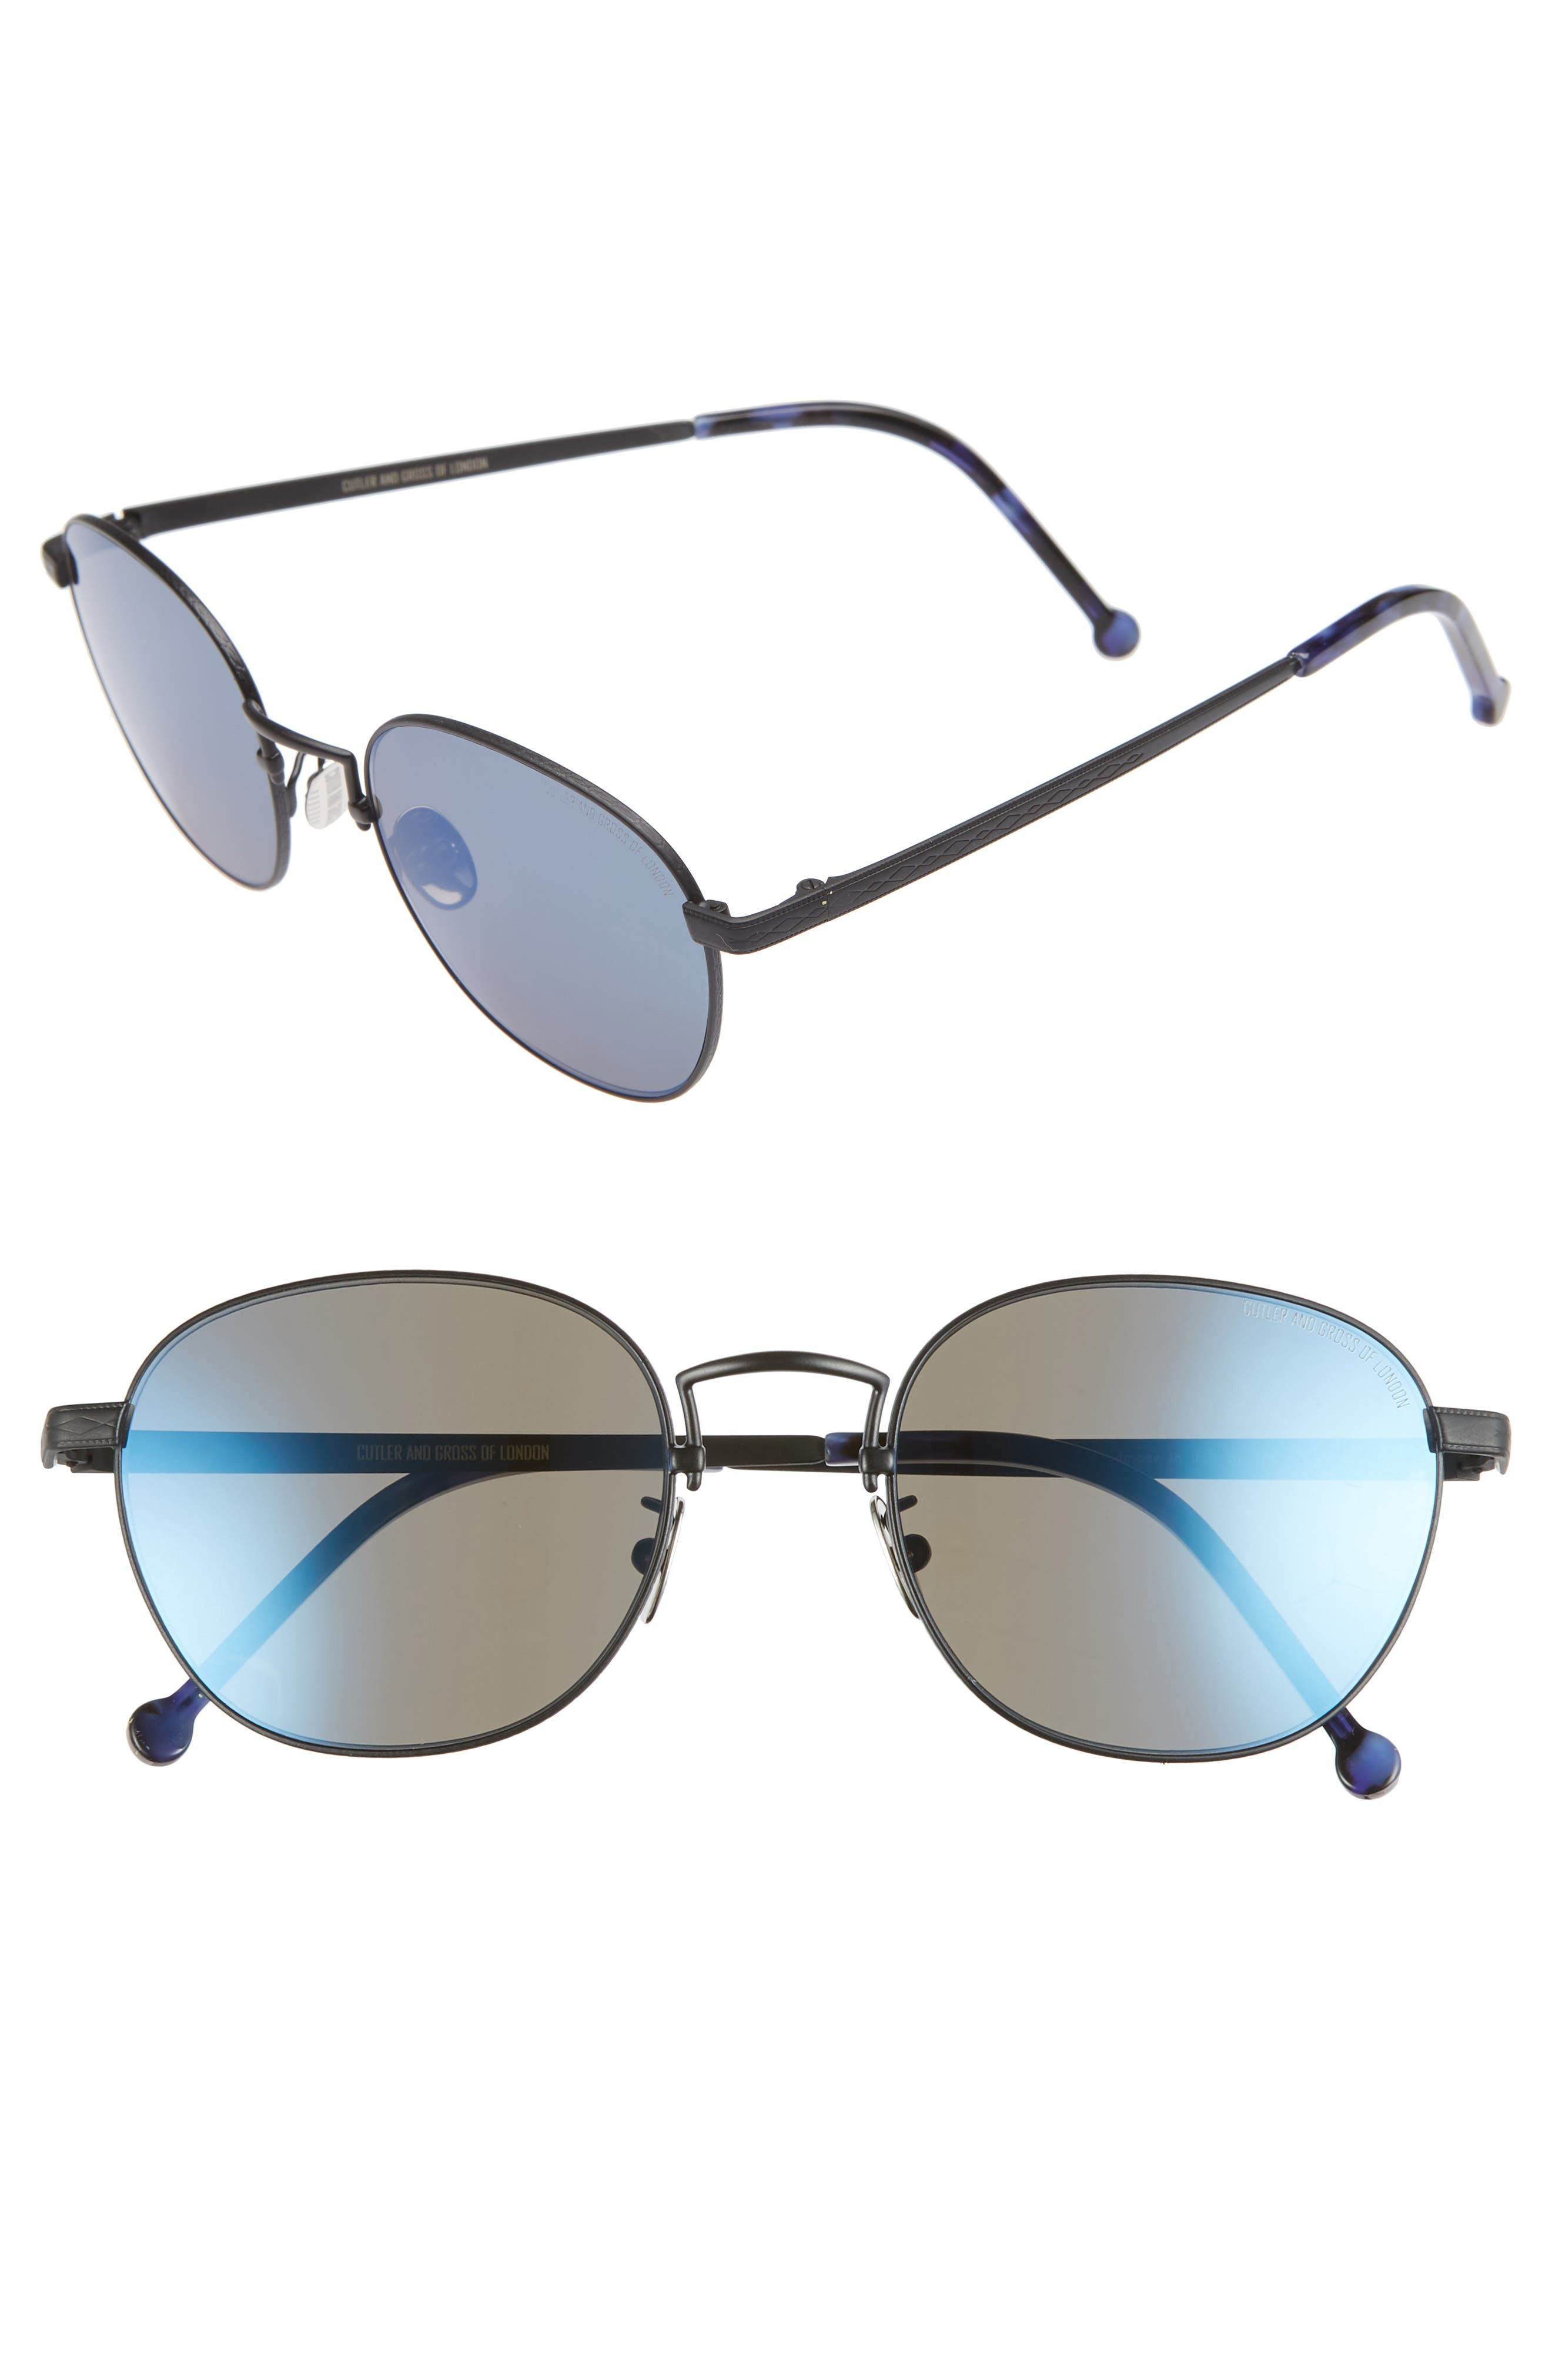 52mm Polarized Round Sunglasses,                         Main,                         color, SATIN PALLADIUM/ BLUE